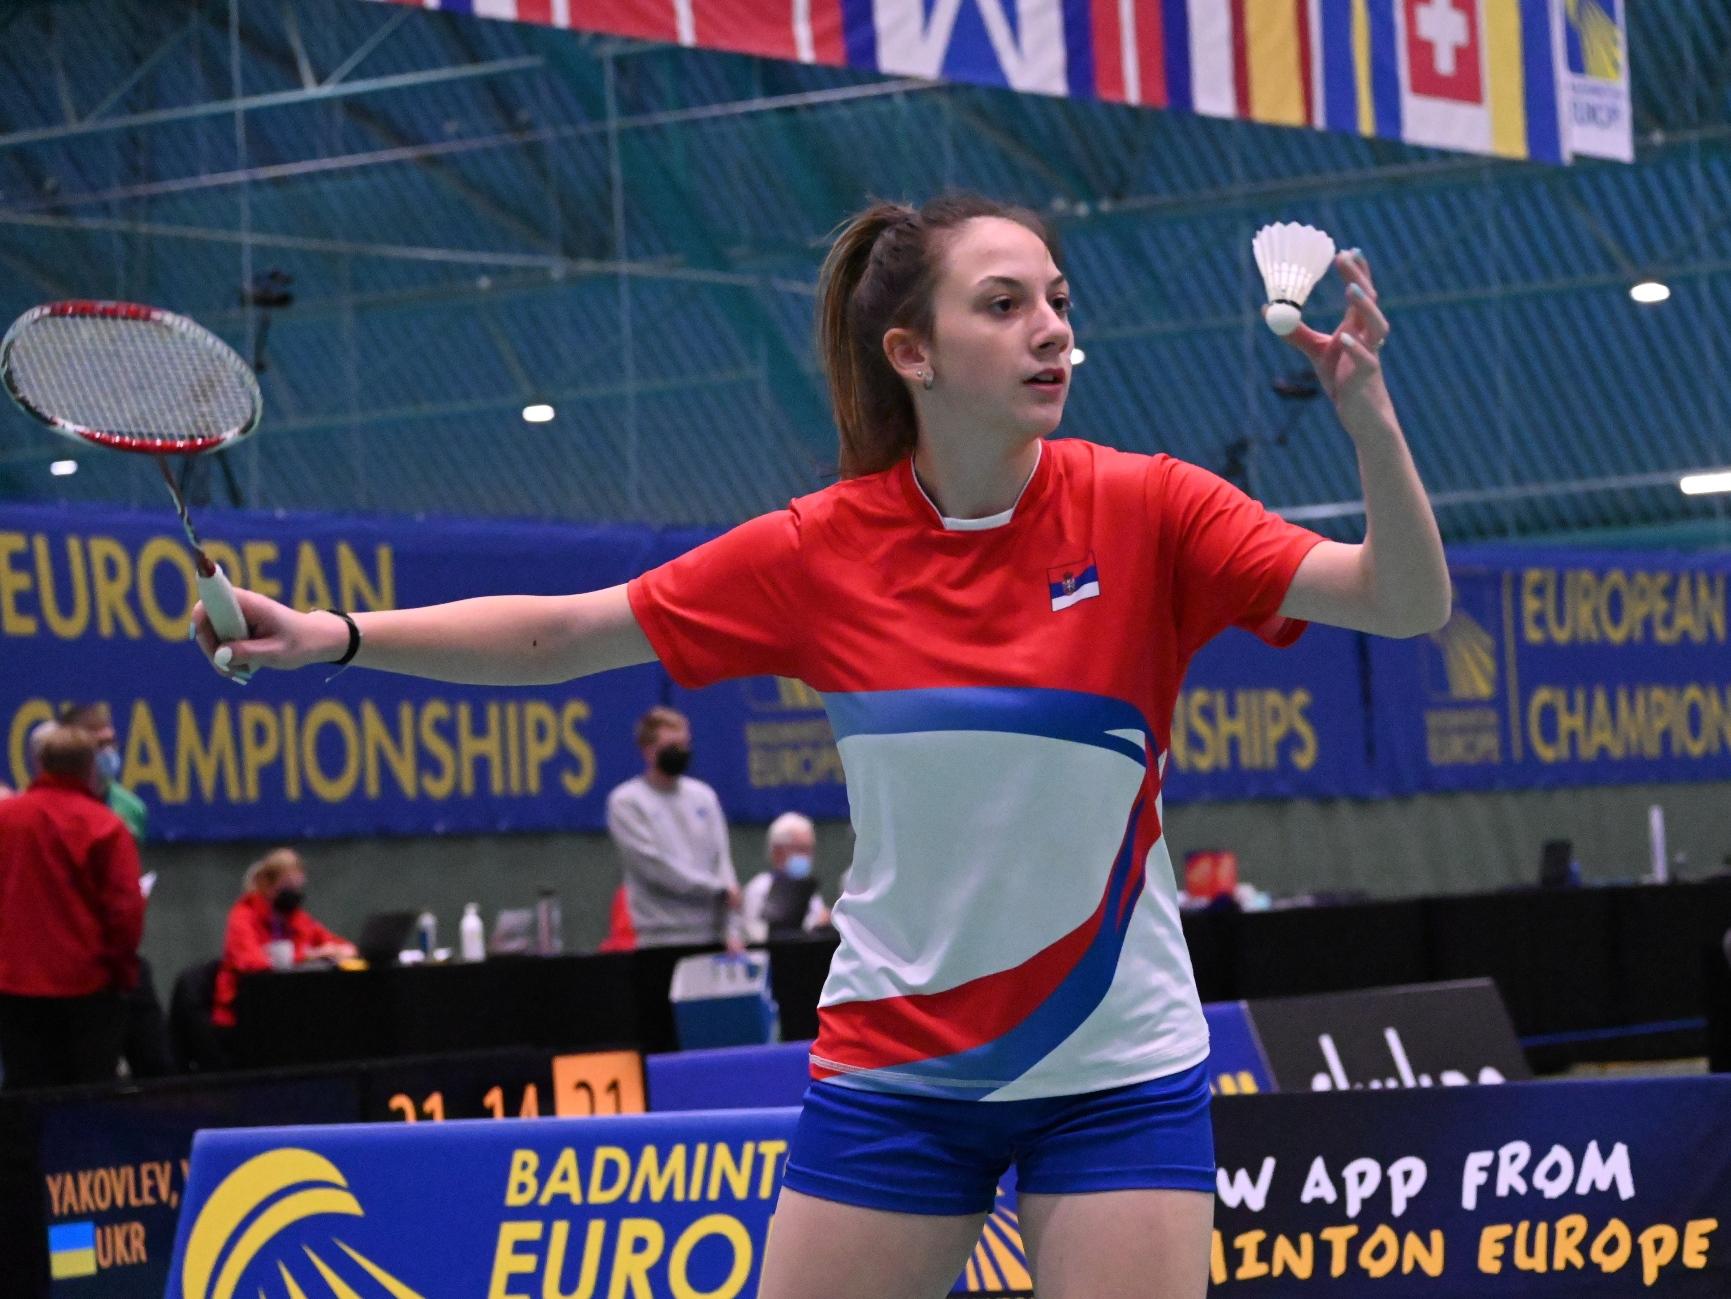 Ph. Badminton Europe